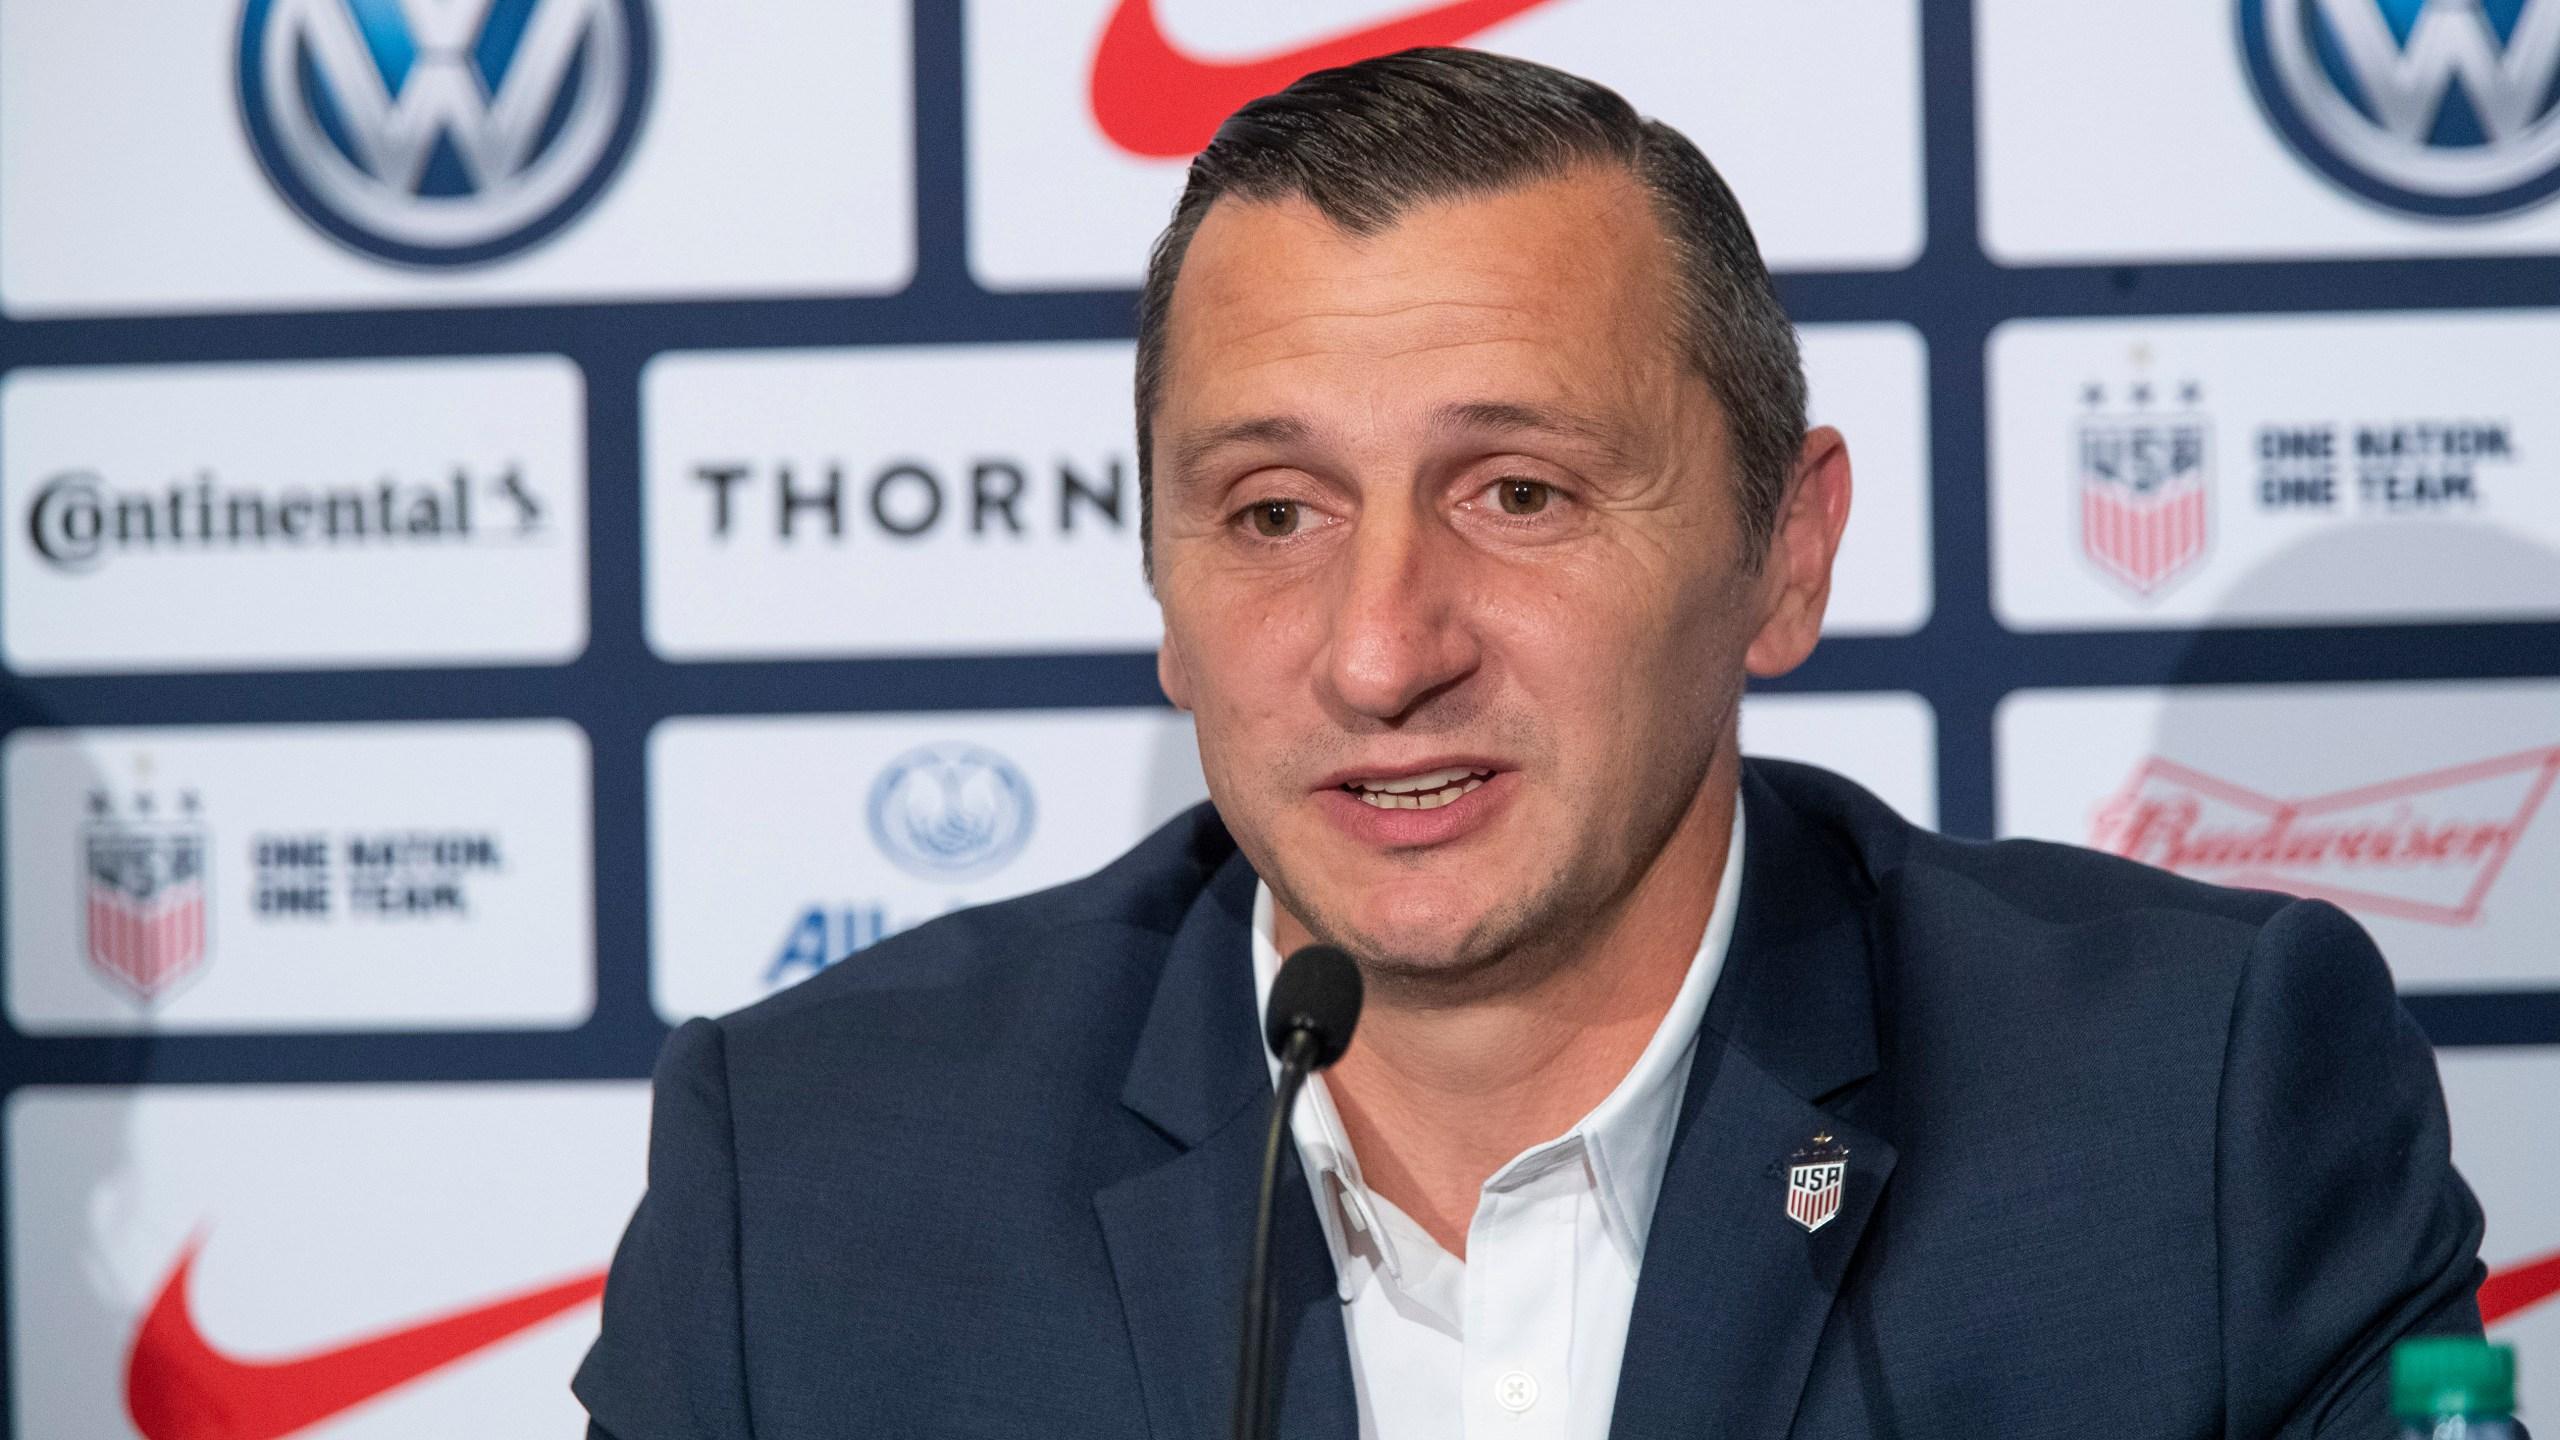 Vlatko Andonovski